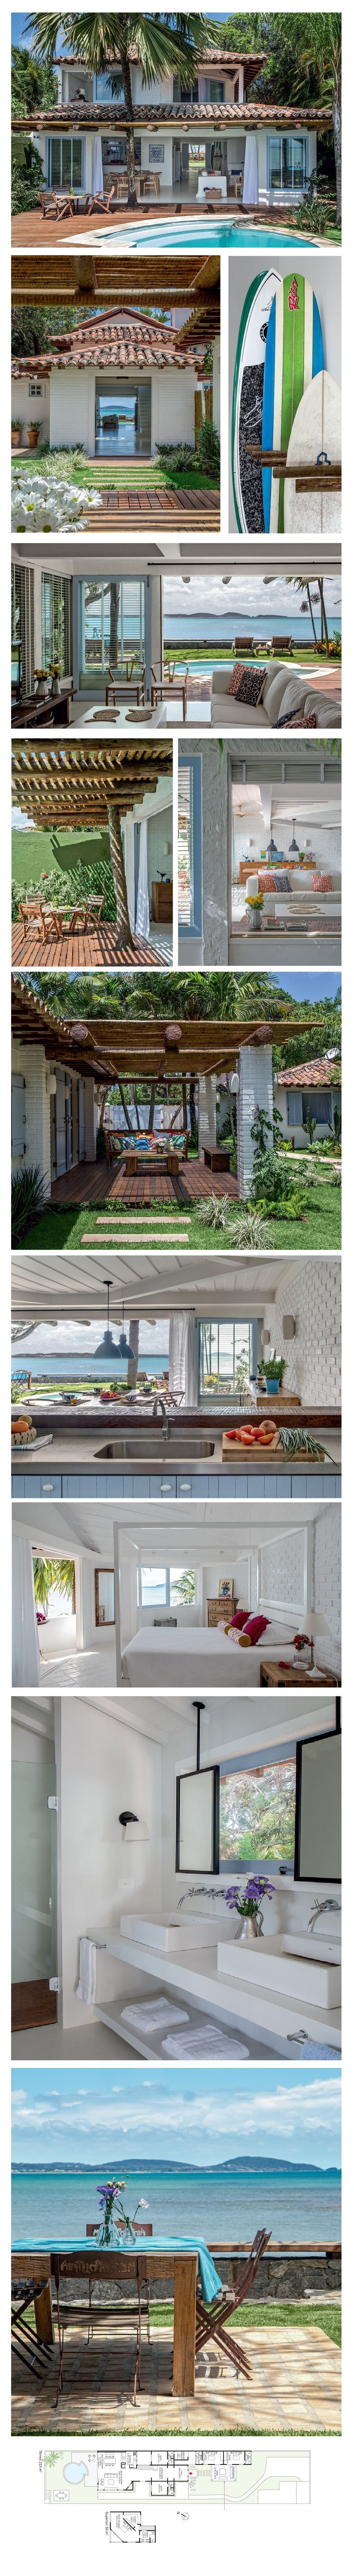 Beach house in Buzios http://casa.abril.com.br/materia/reforma-na-casa-em-buzios#1